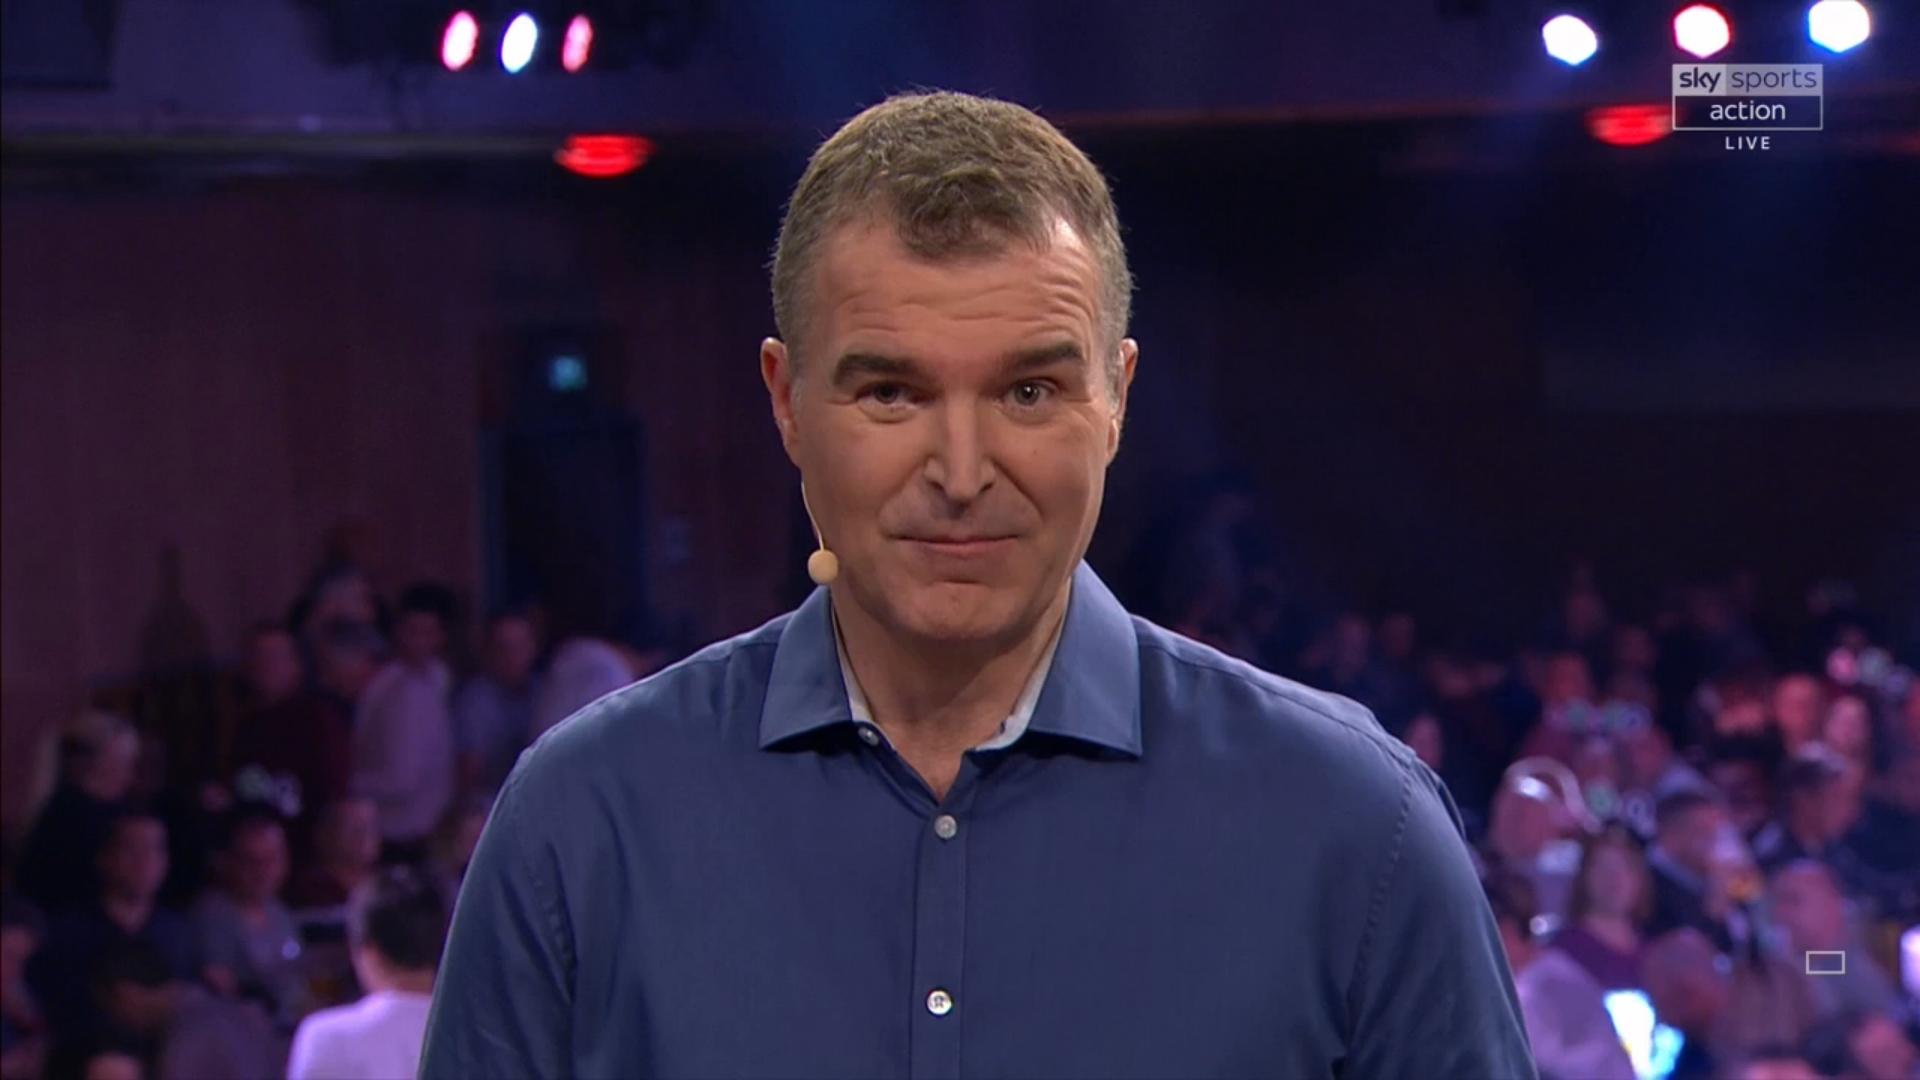 World Darts Championship 2019/20 – Live TV Coverage on Sky Sports Darts